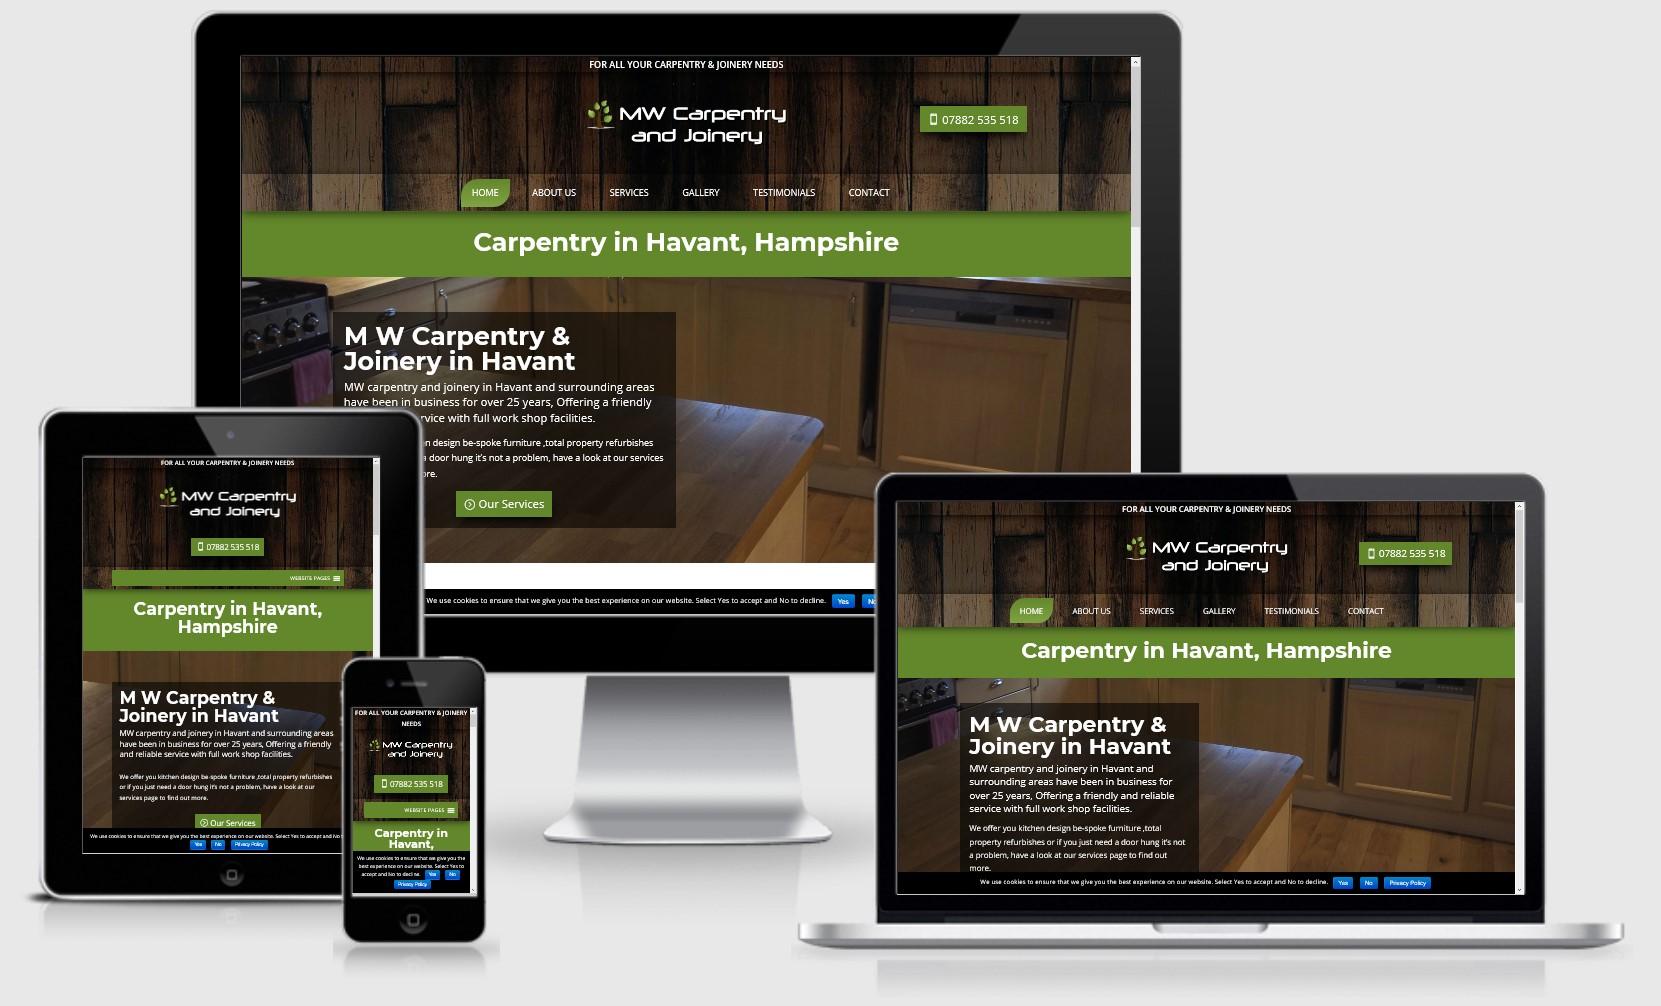 MW Carpentry Havant Website